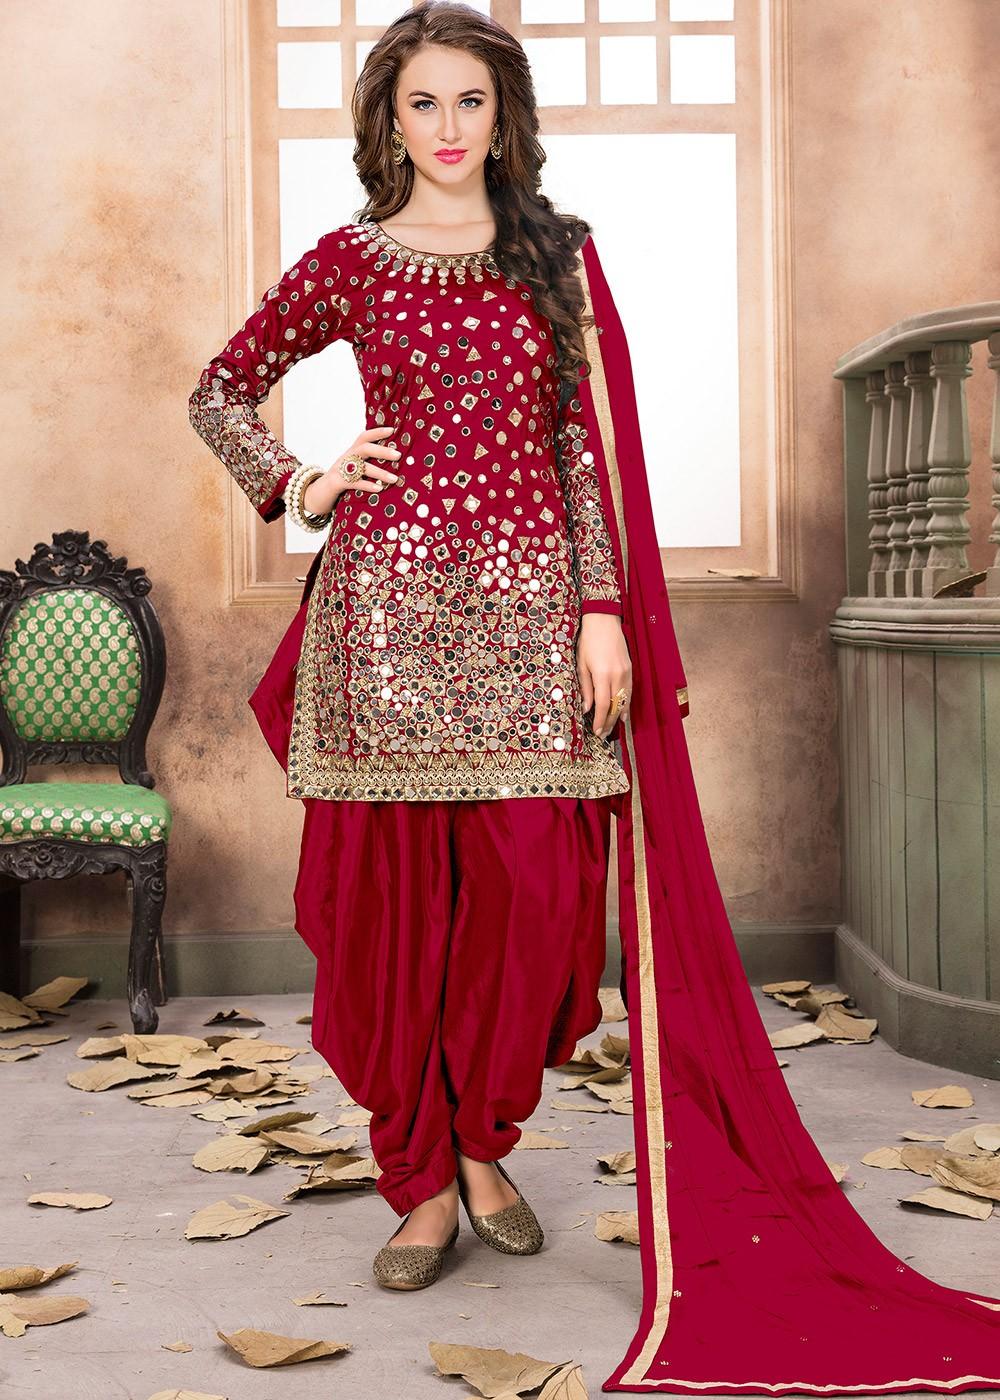 872cc38505 Red Art Silk Punjabi Salwar Suit With Dupatta. Indian Salwar Kameez - Buy  Red Art Silk Punjabi Suits Shopping Online With Dupatta USA